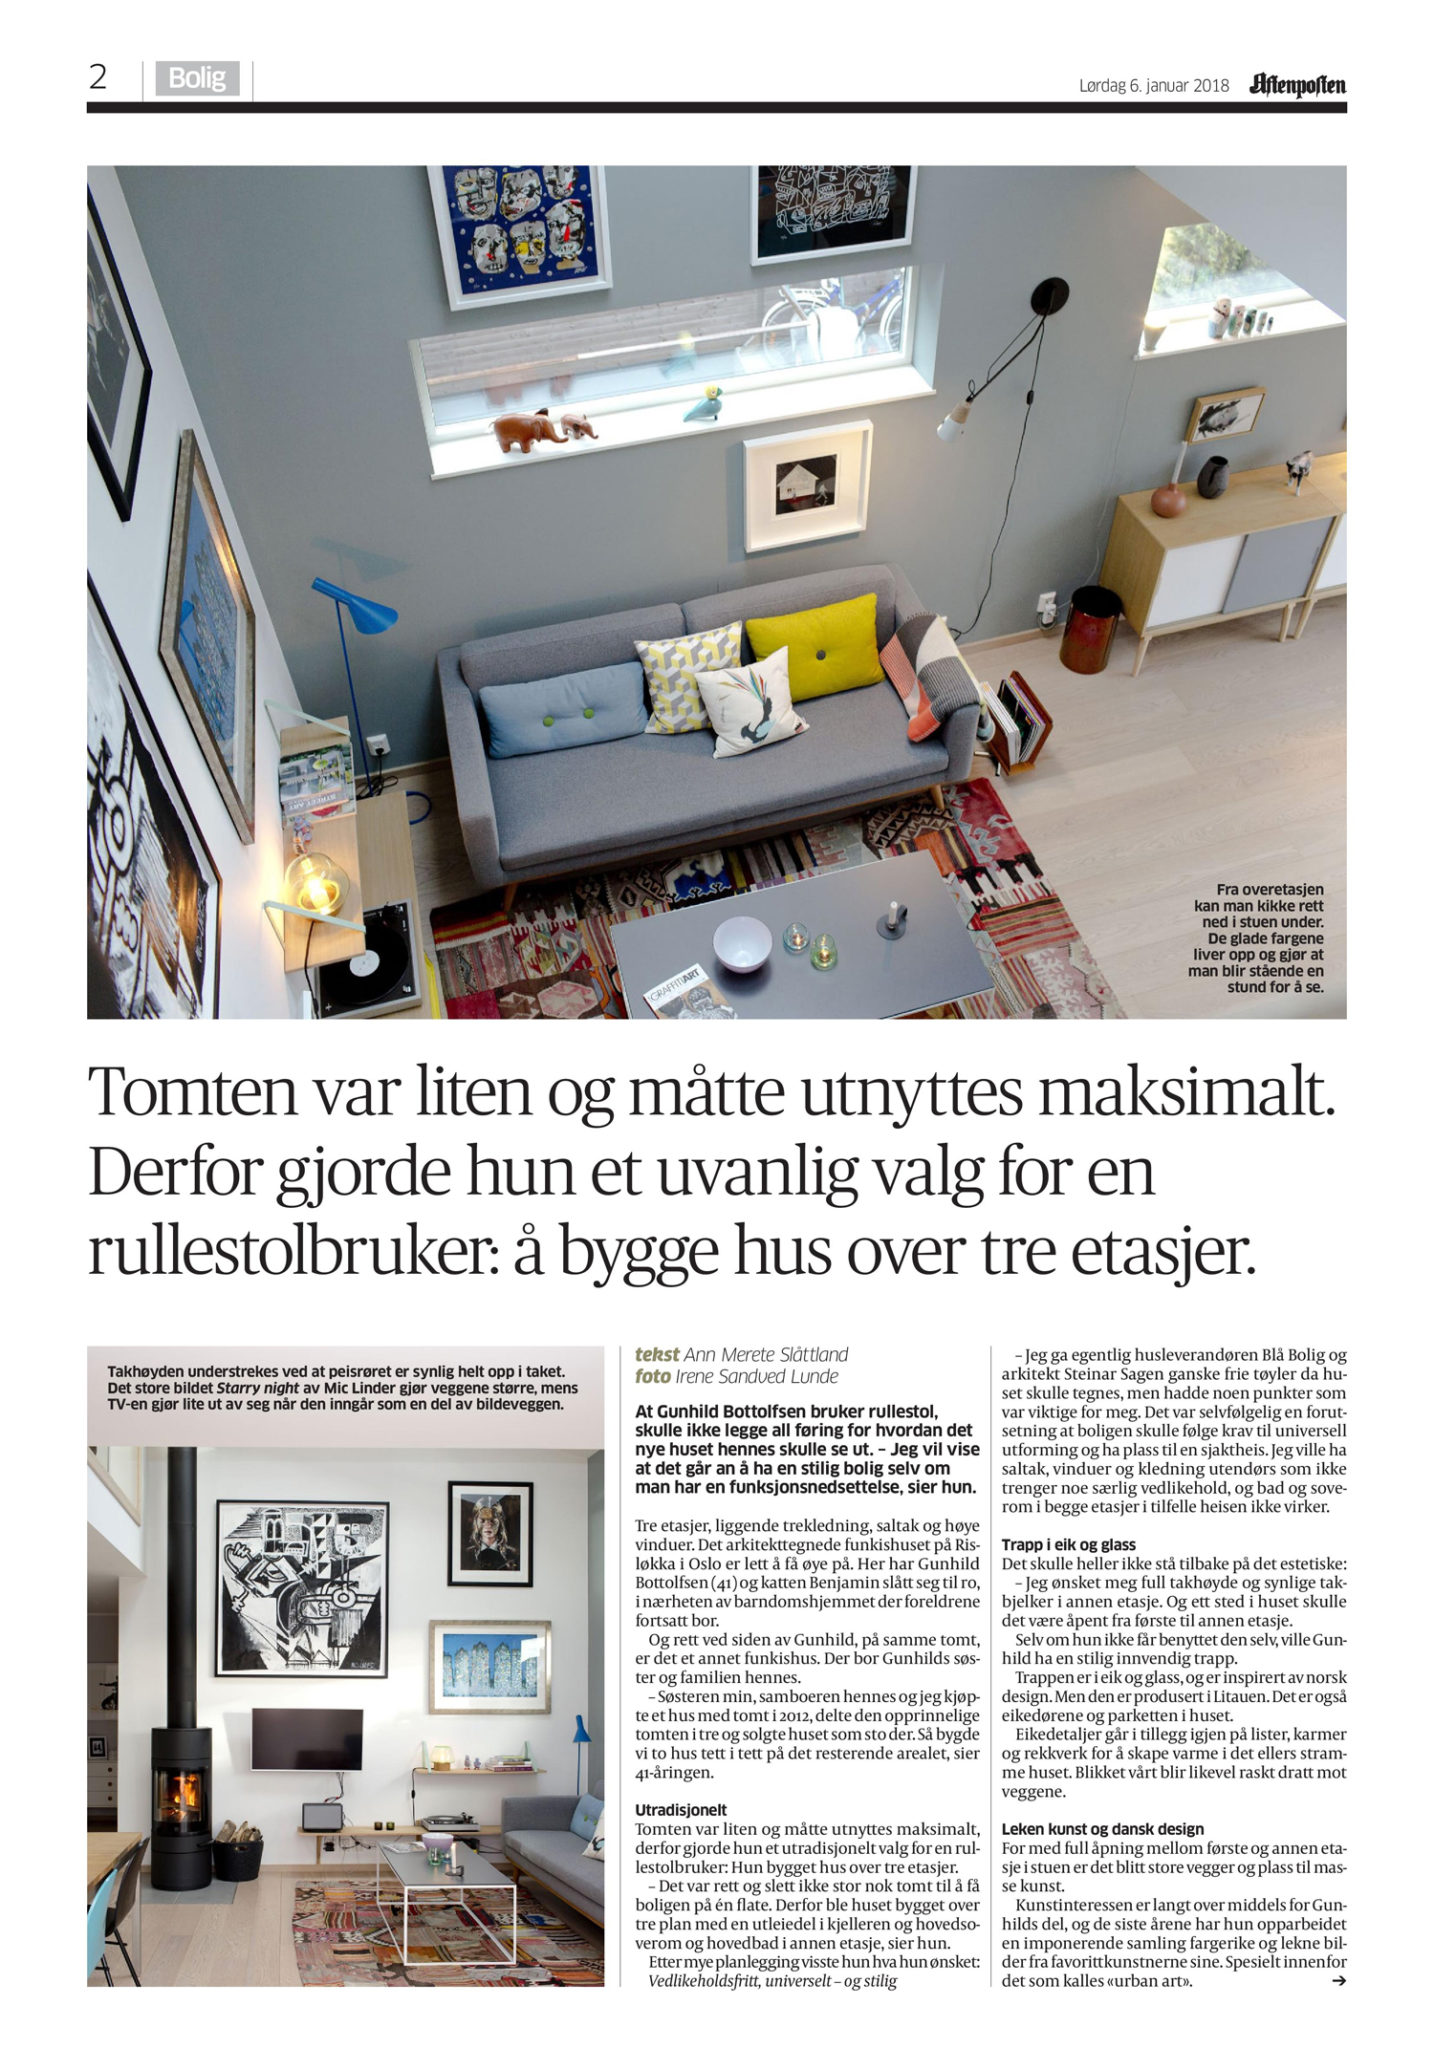 Gunhild Bottolfsen funkishus Aftenposten